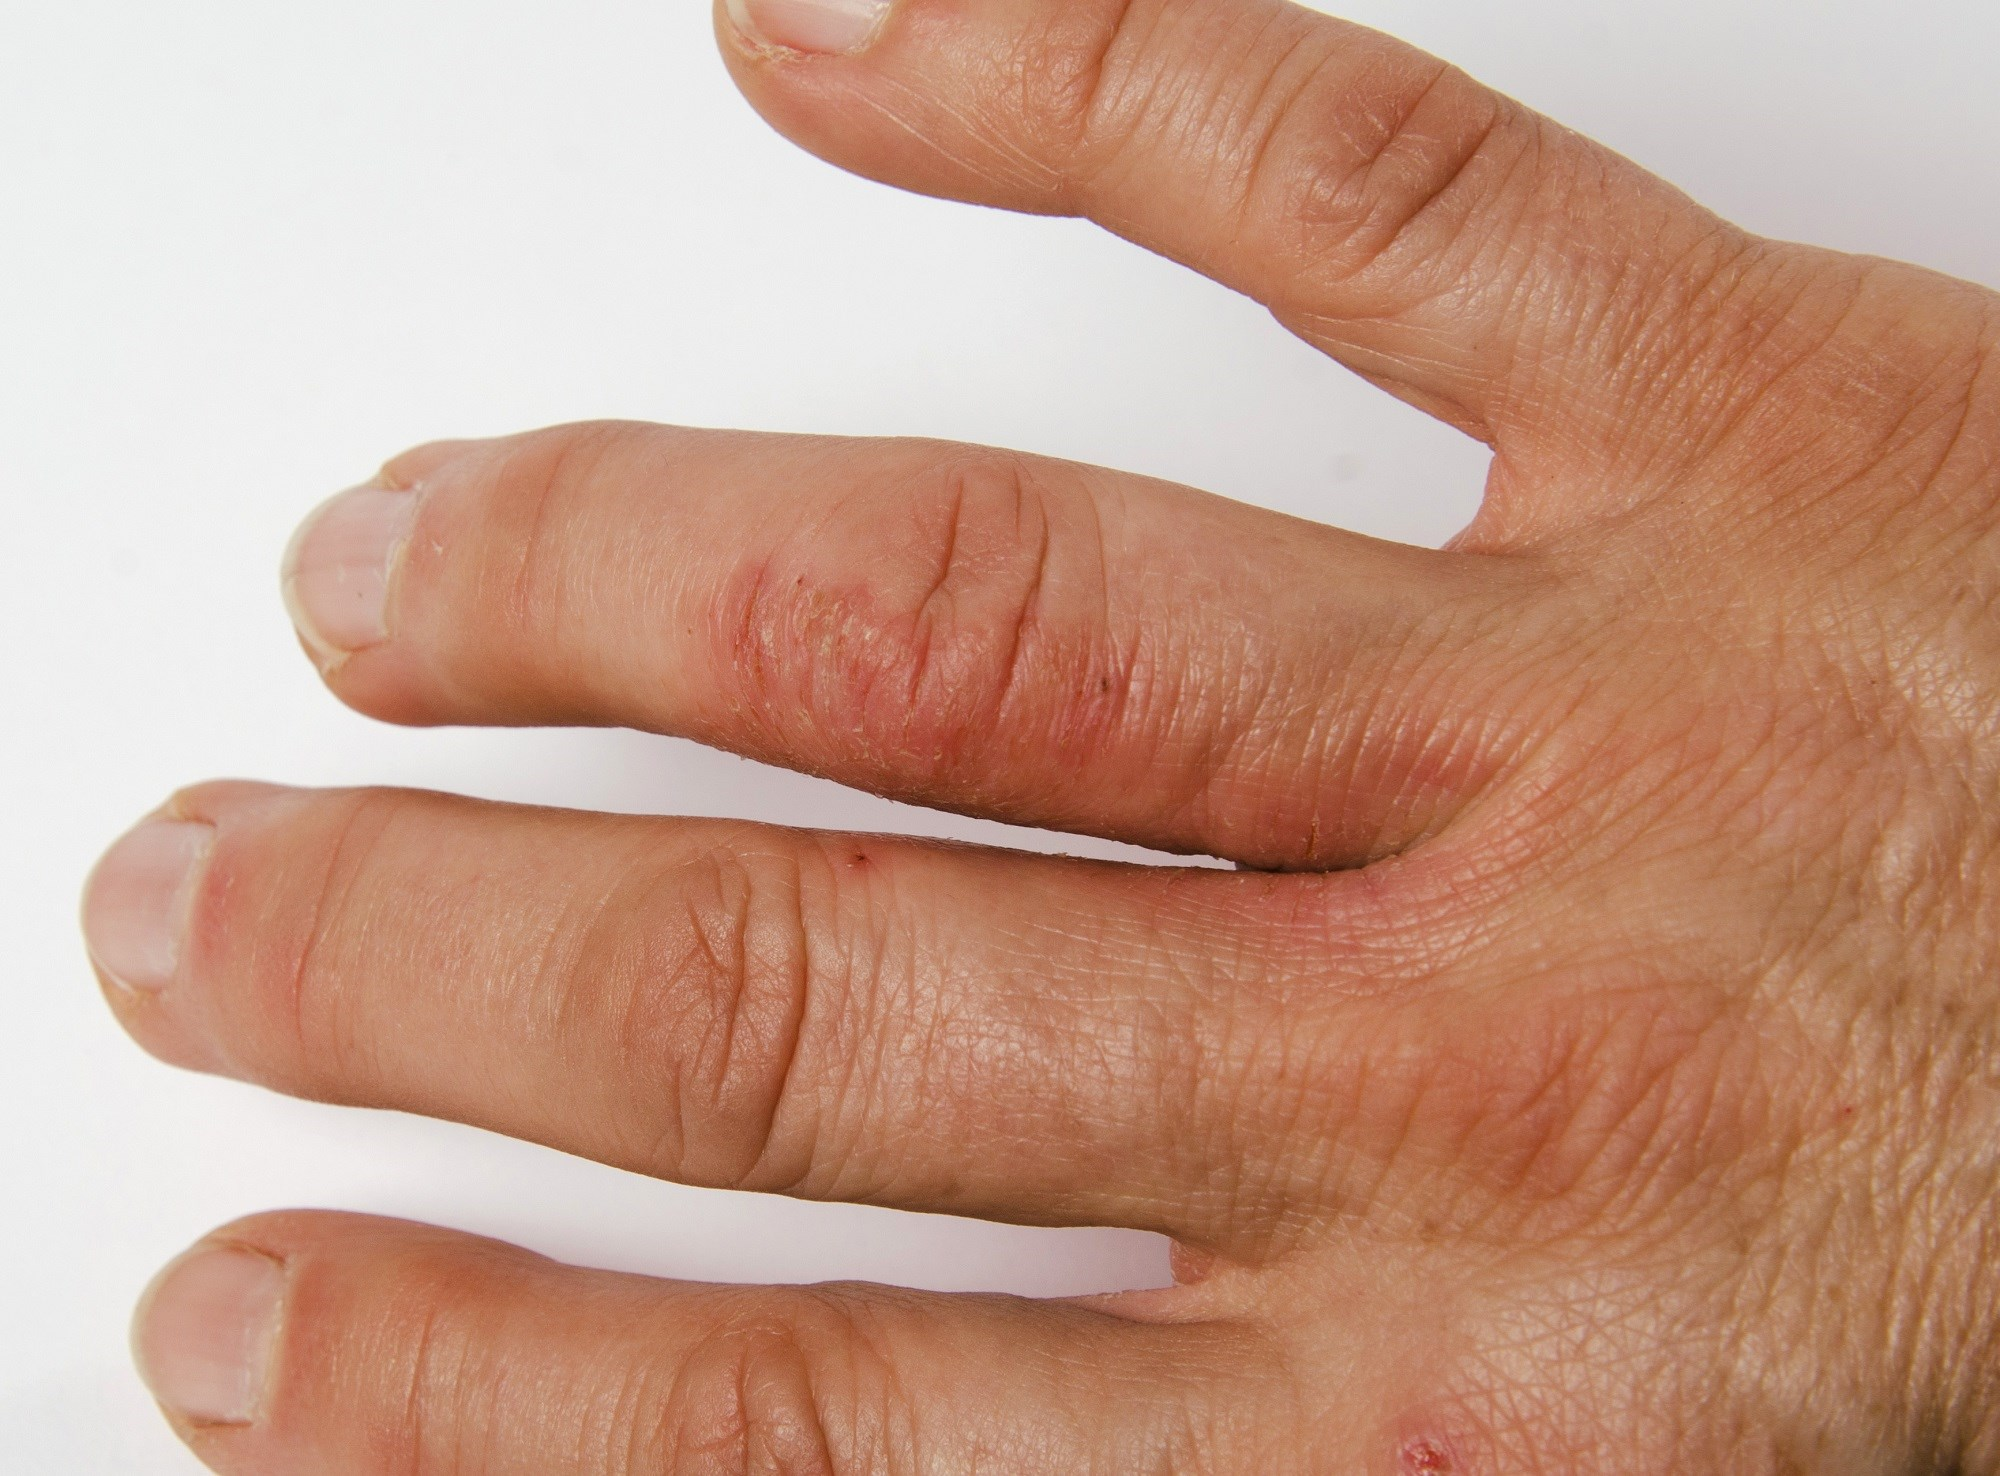 Filgotinib Effective for Treatment of Active Psoriatic Arthritis